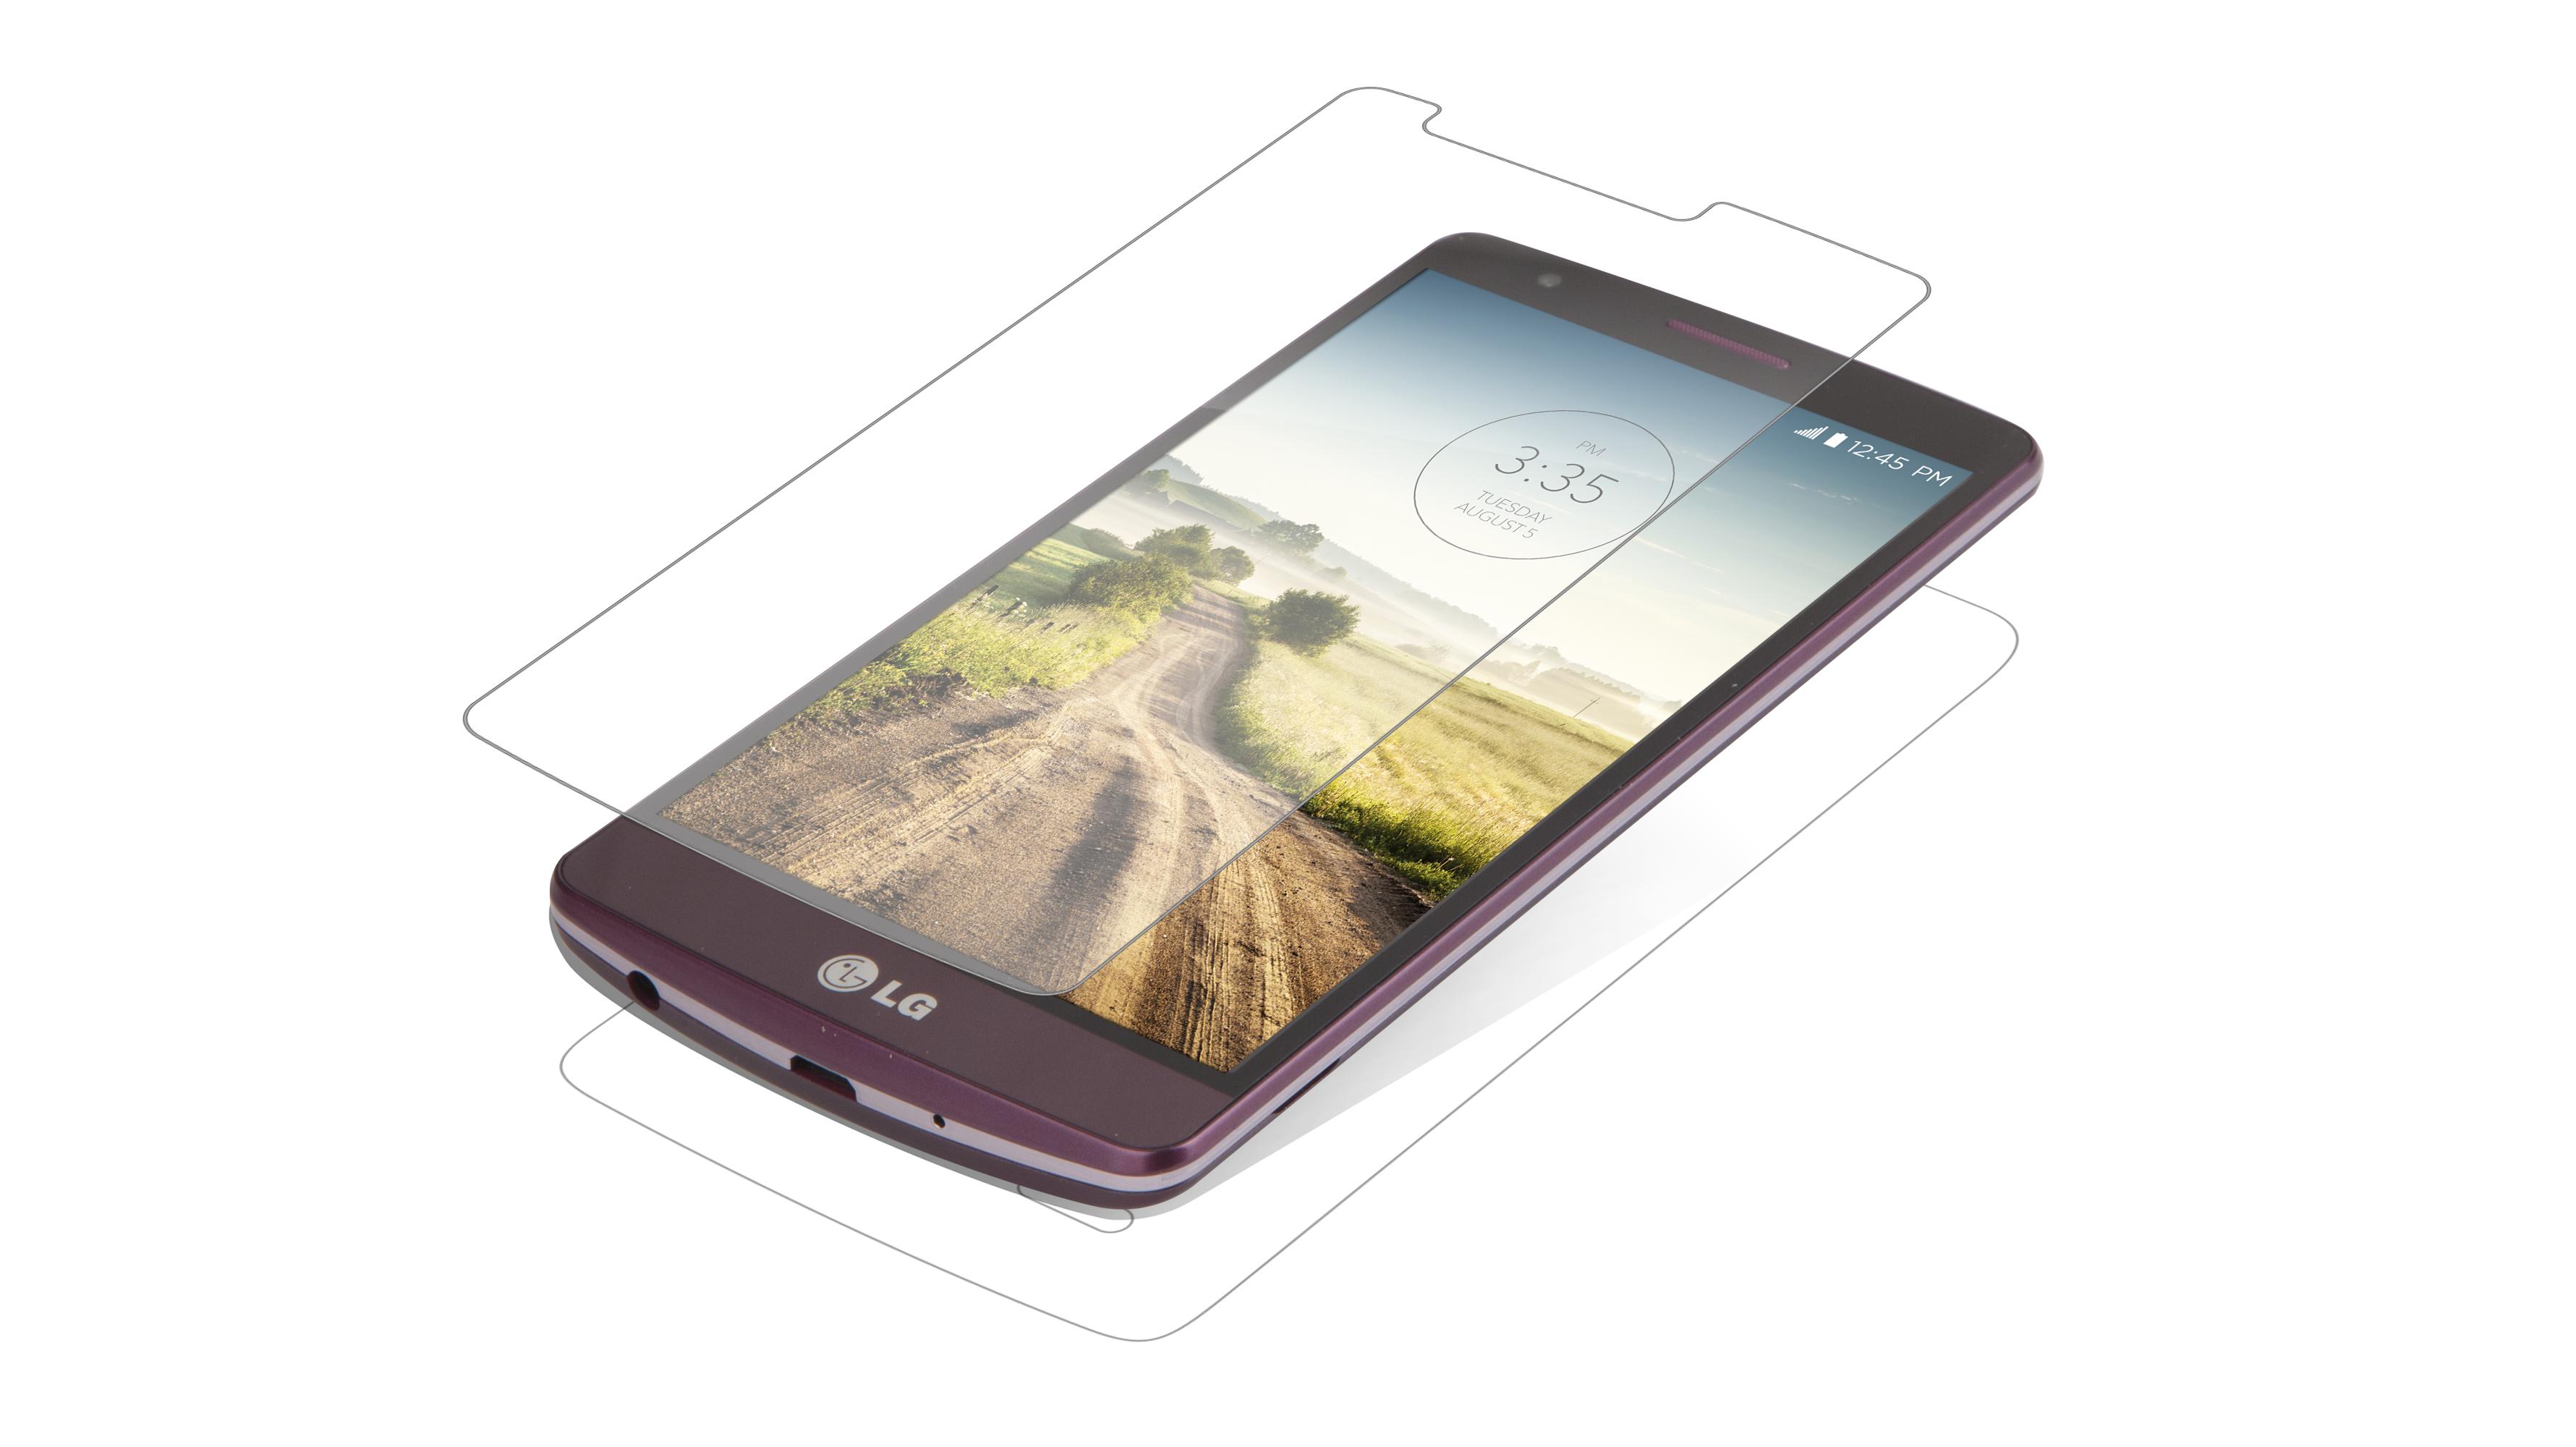 InvisibleShield Original for the LG G3 Mini/Vigor